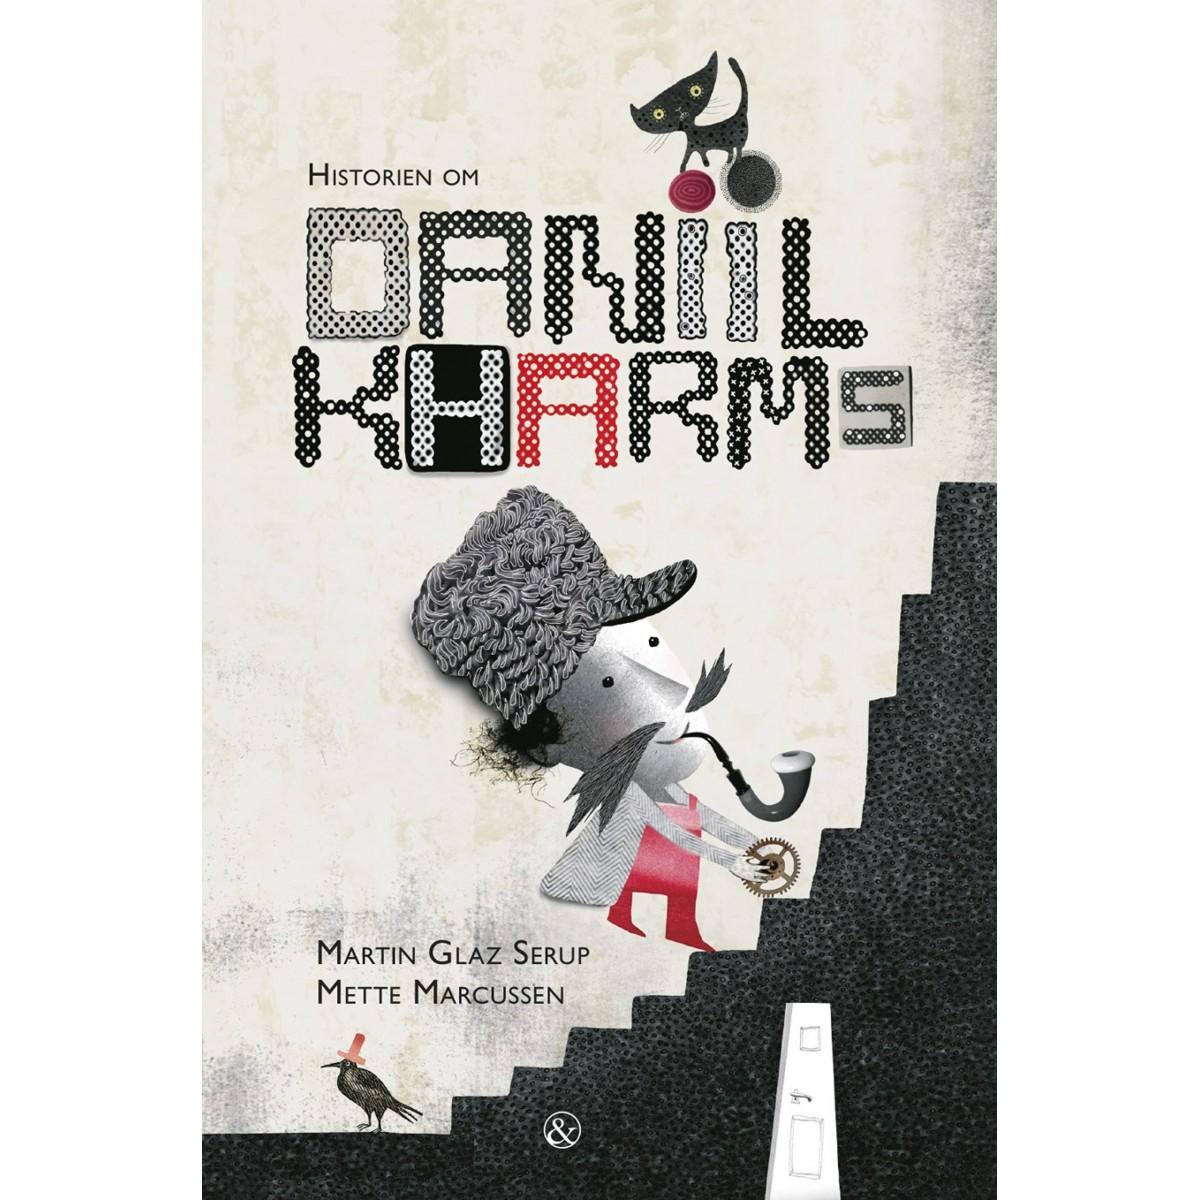 Martin Glaz Serup: Historien om Daniil Kharms